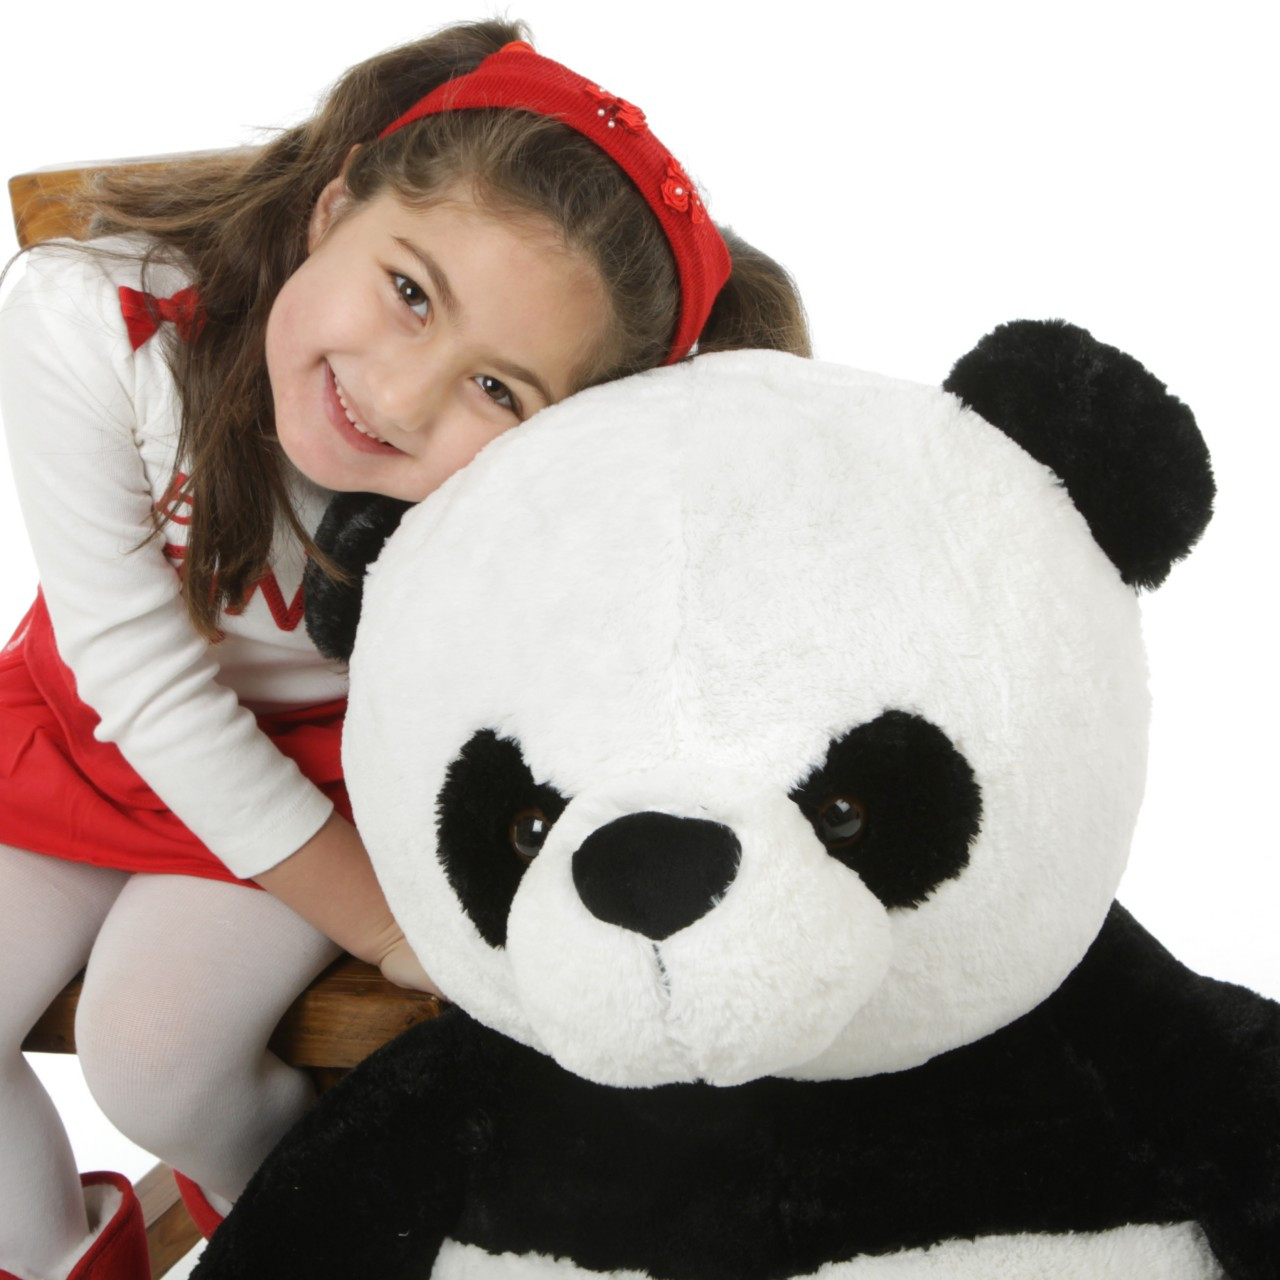 Mama Xin Huggable Black and White Stuffed Panda Teddy Bear 36in